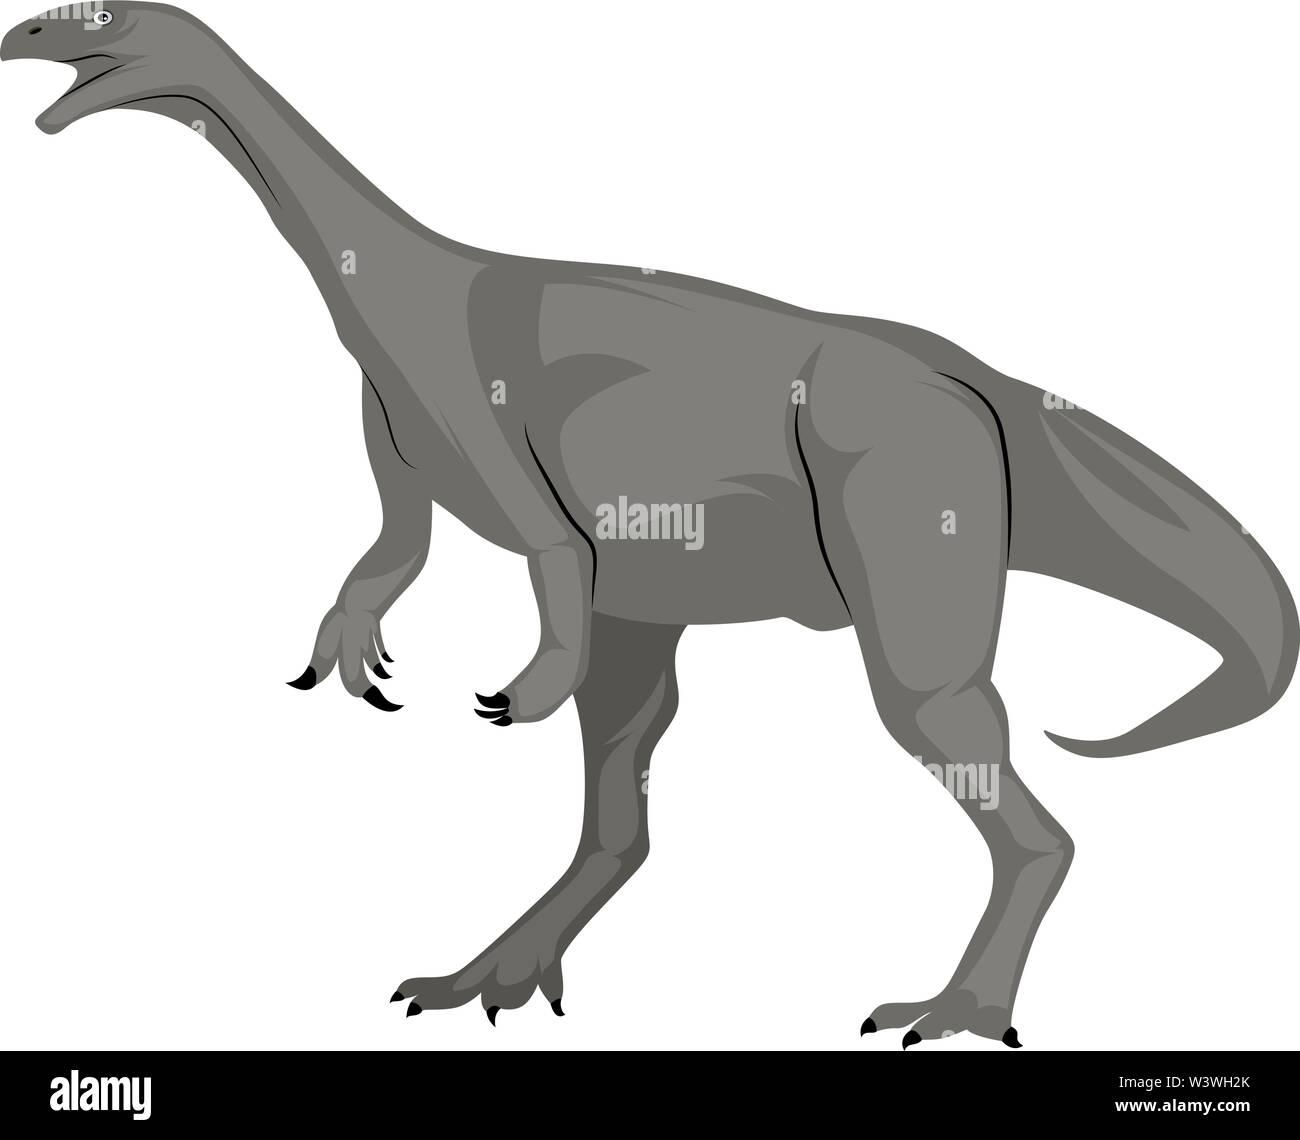 Grey dinosour, illustration, vector on white background. - Stock Image